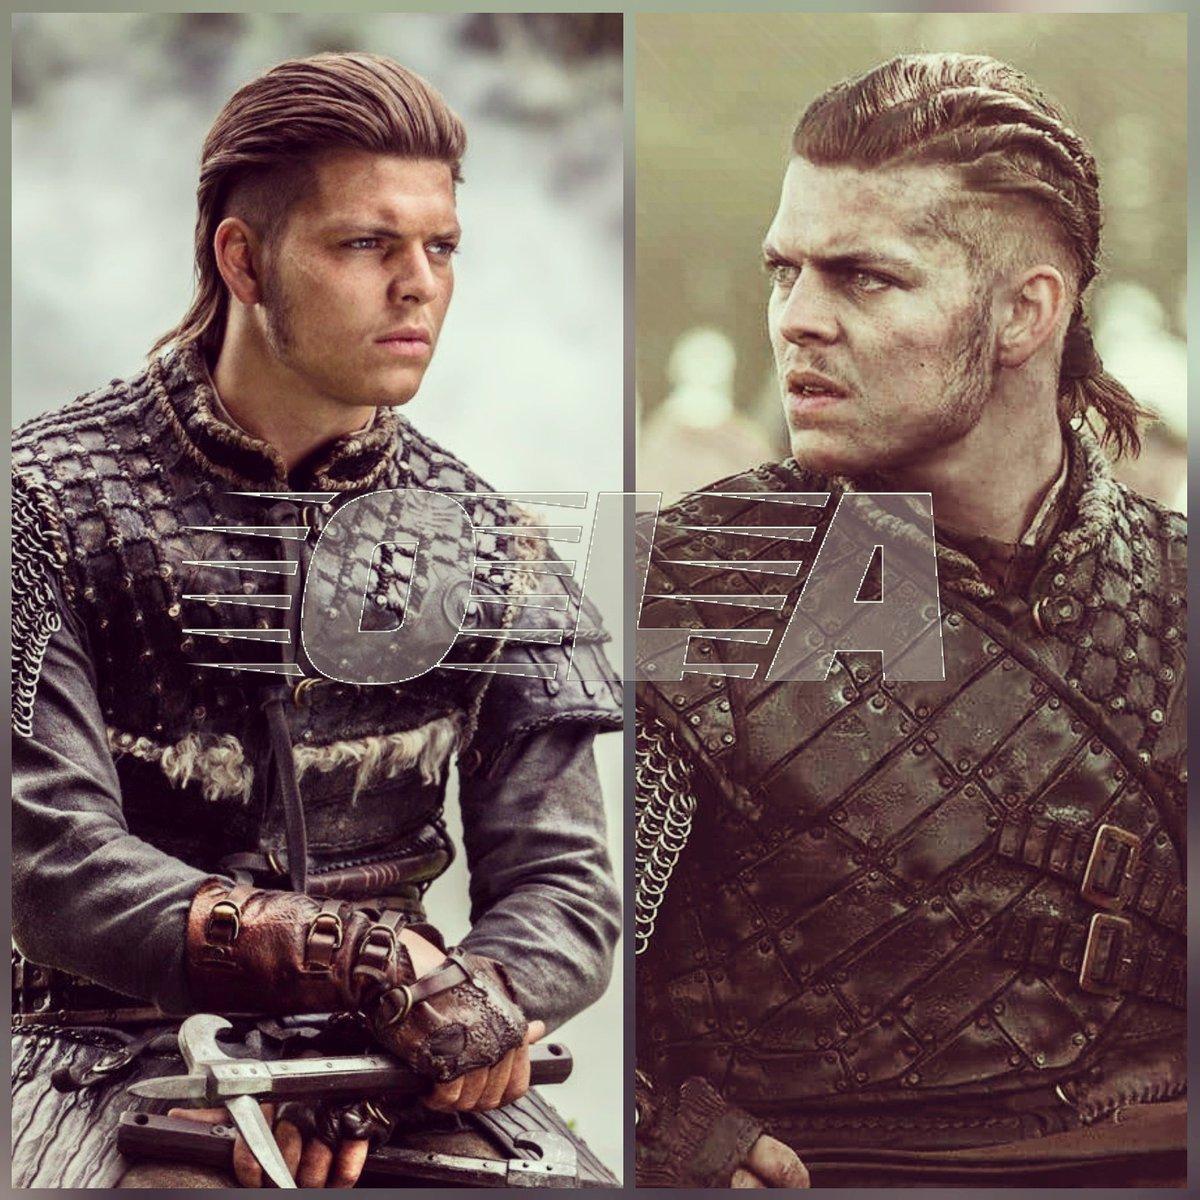 #magnificentmanmonday #ivartheboneless  sexiest Ragnar's son #alexhoeghandersen #vikingspic.twitter.com/m7LyqNfodN